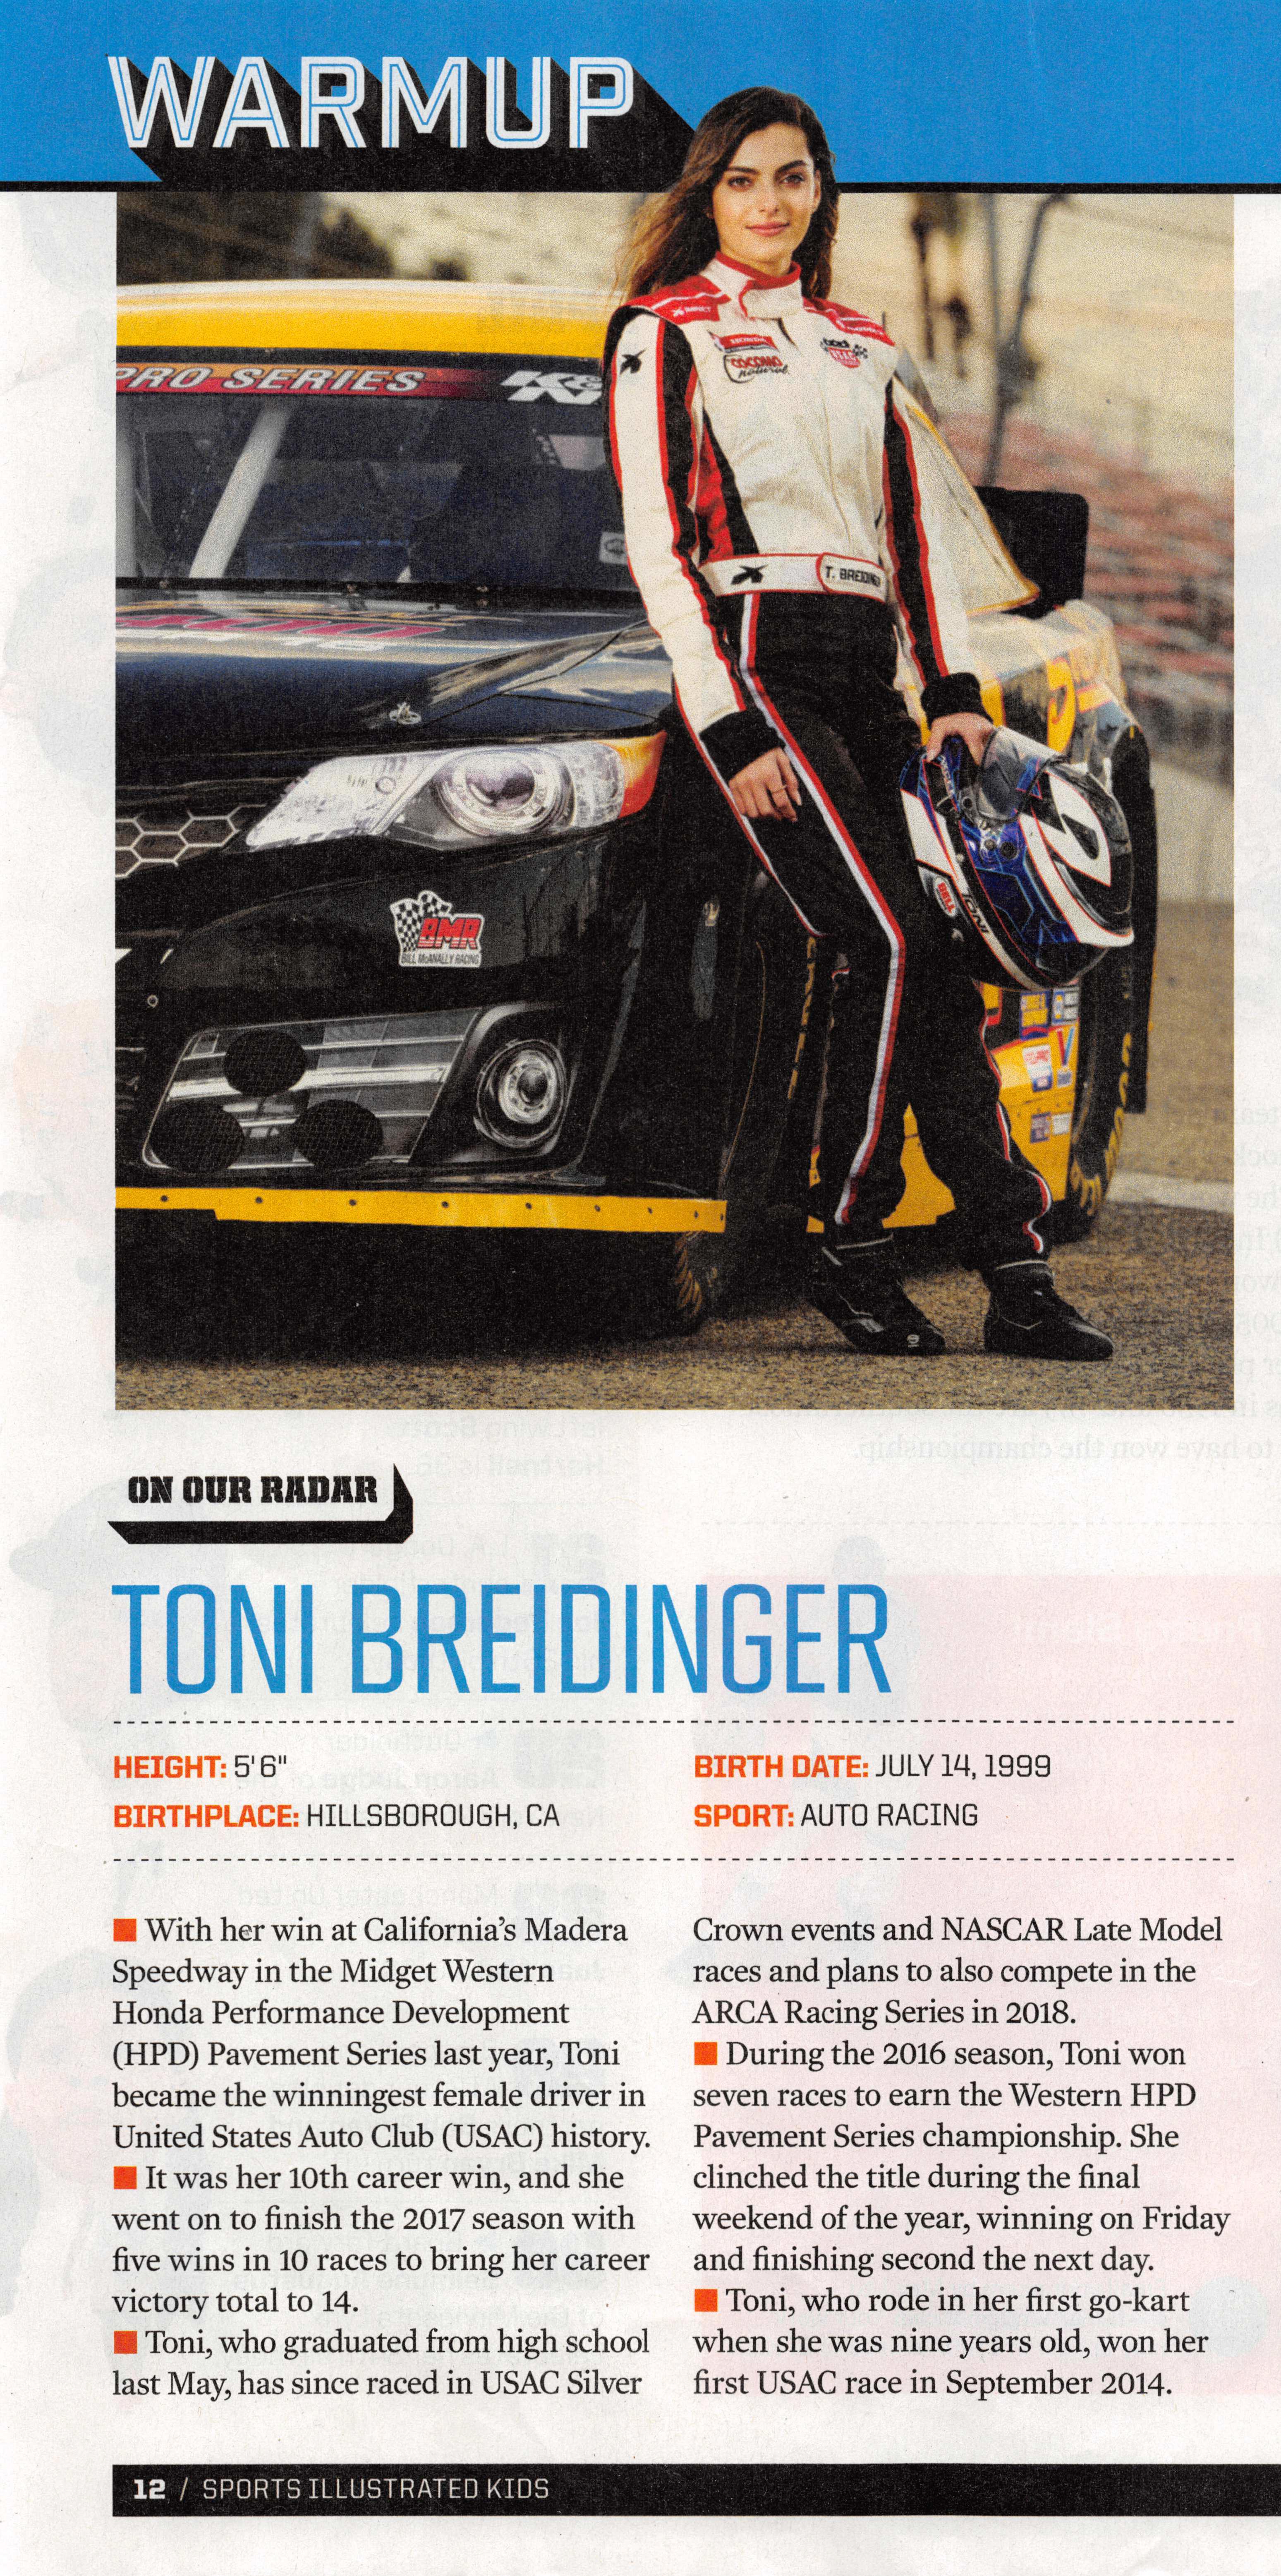 Sports Illustrated Kids feat. Toni Breidinger